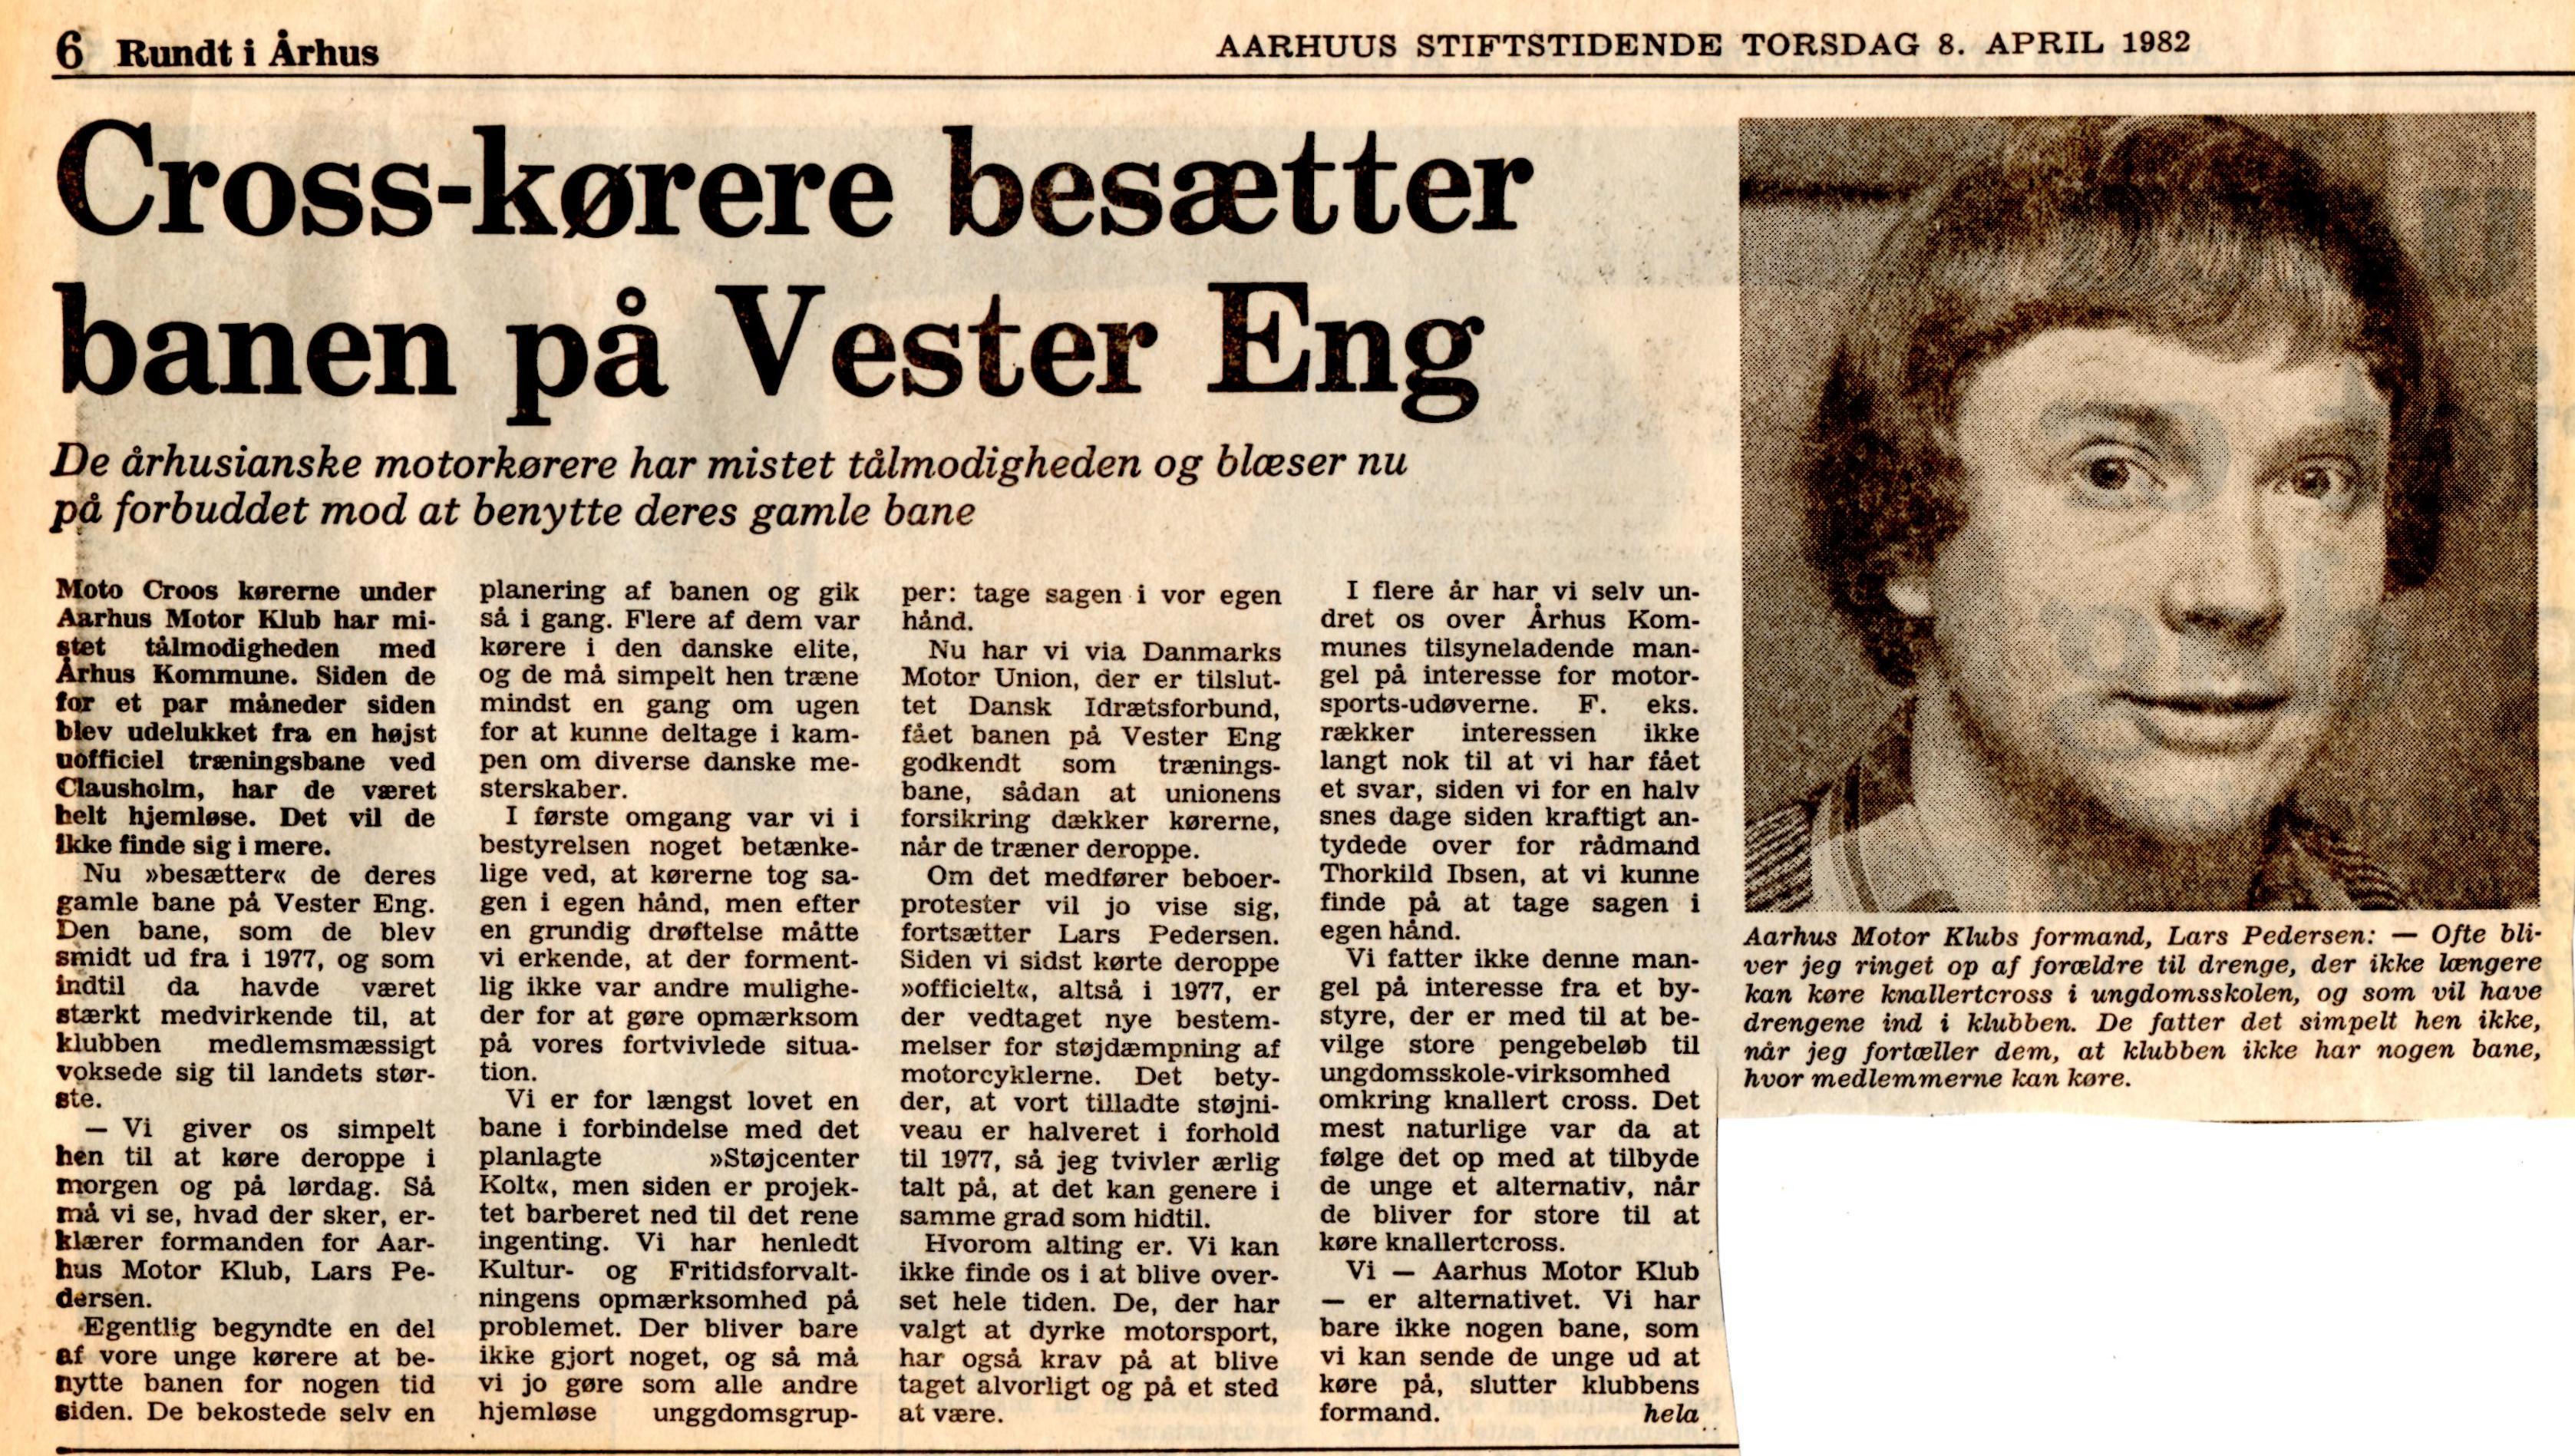 Avisklip Vester Eng besat 8-4-82 img2